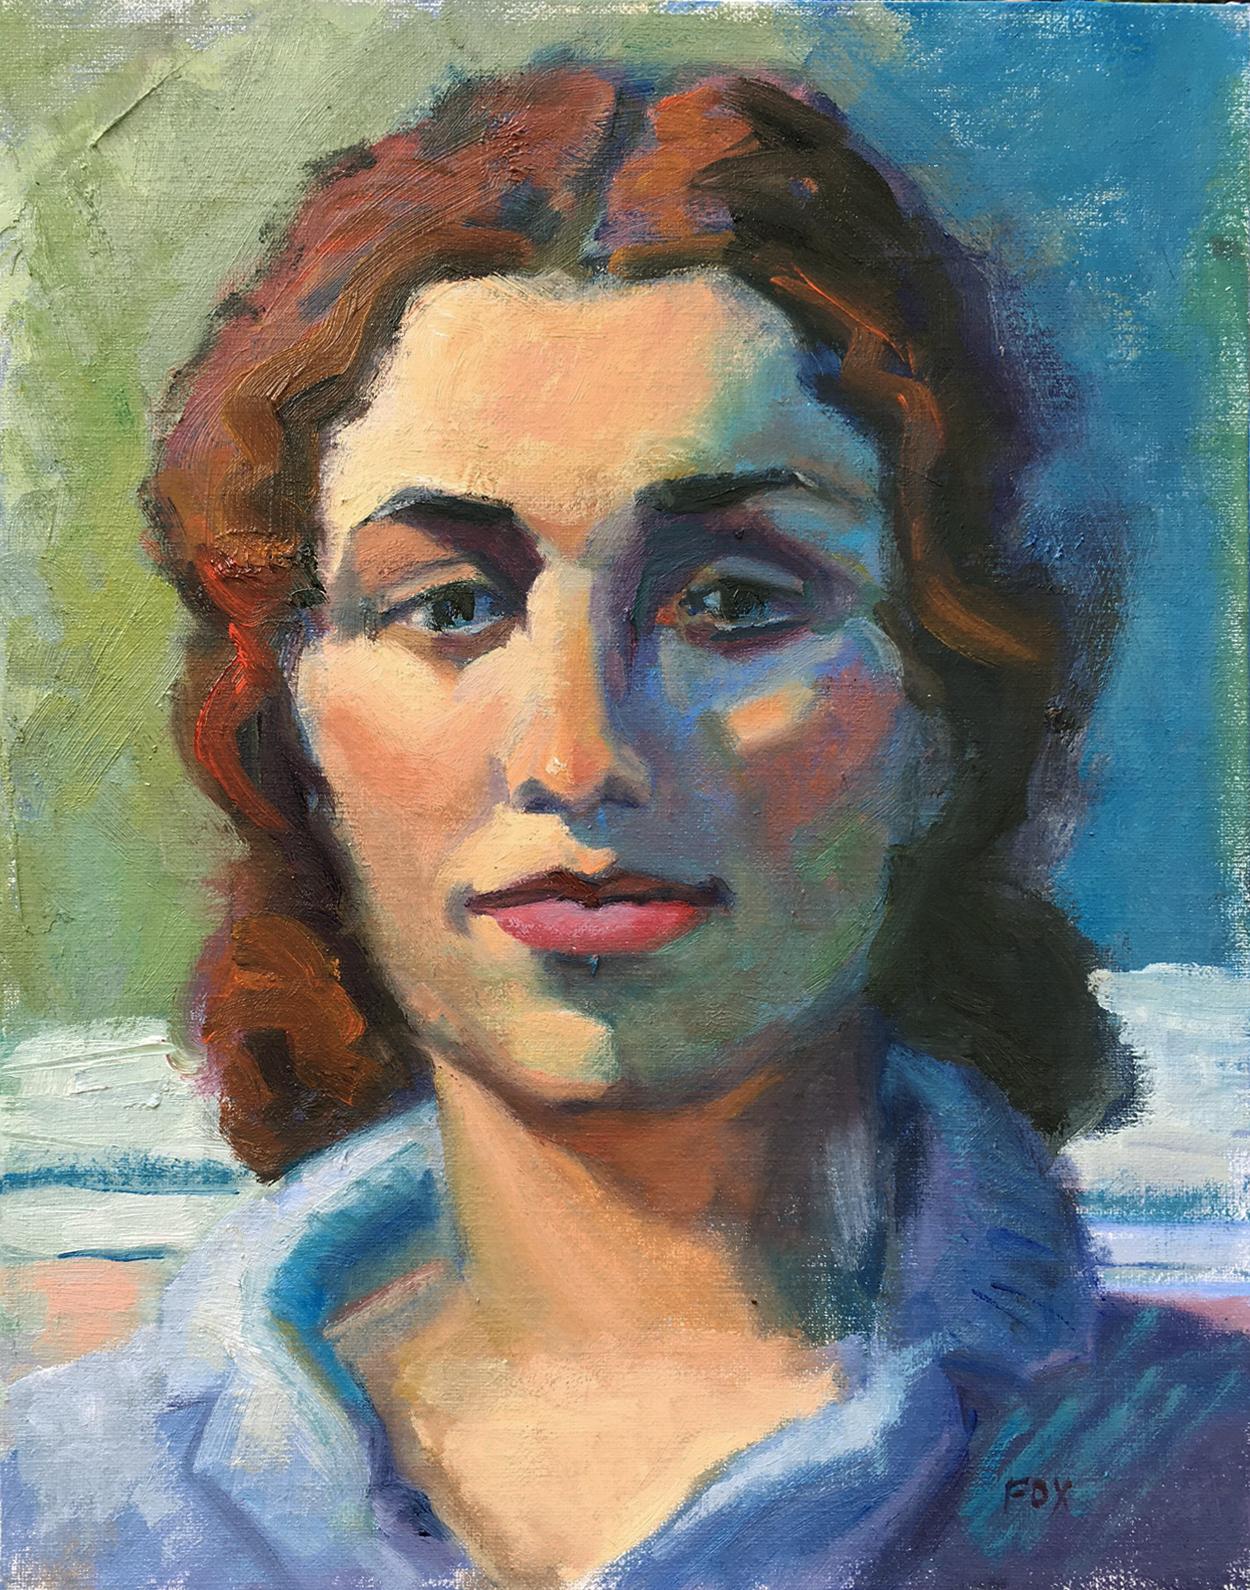 Woman By Beach Portrait Figurative Oil Painting Face Female Figuration Contemporary Figure Painter